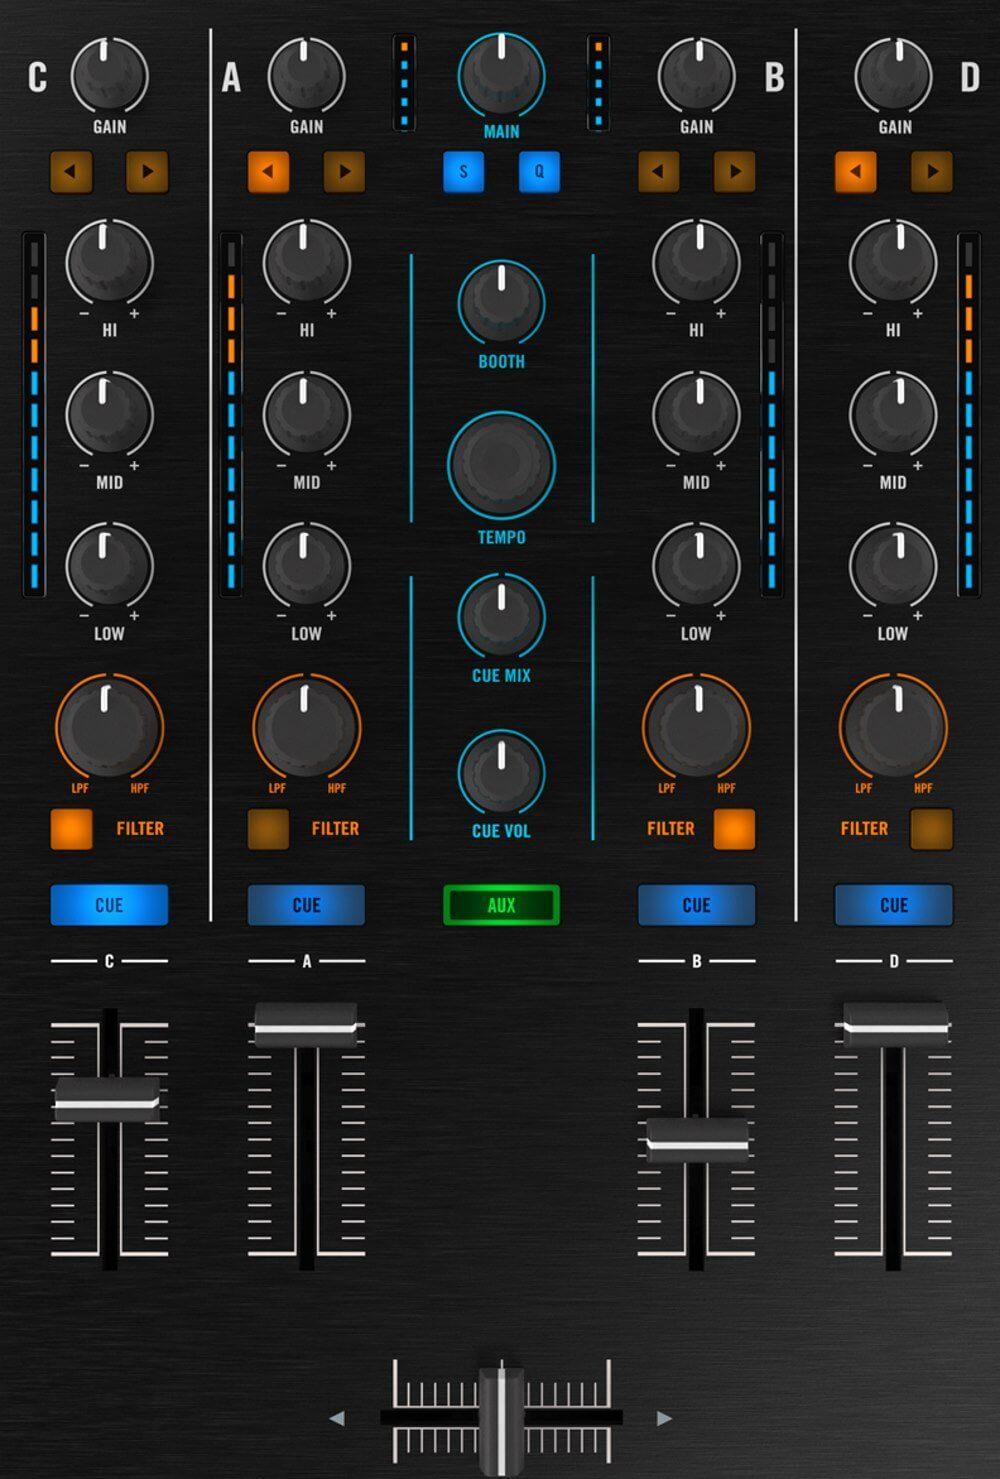 Native Instruments Traktor Kontrol S5 mixer section.